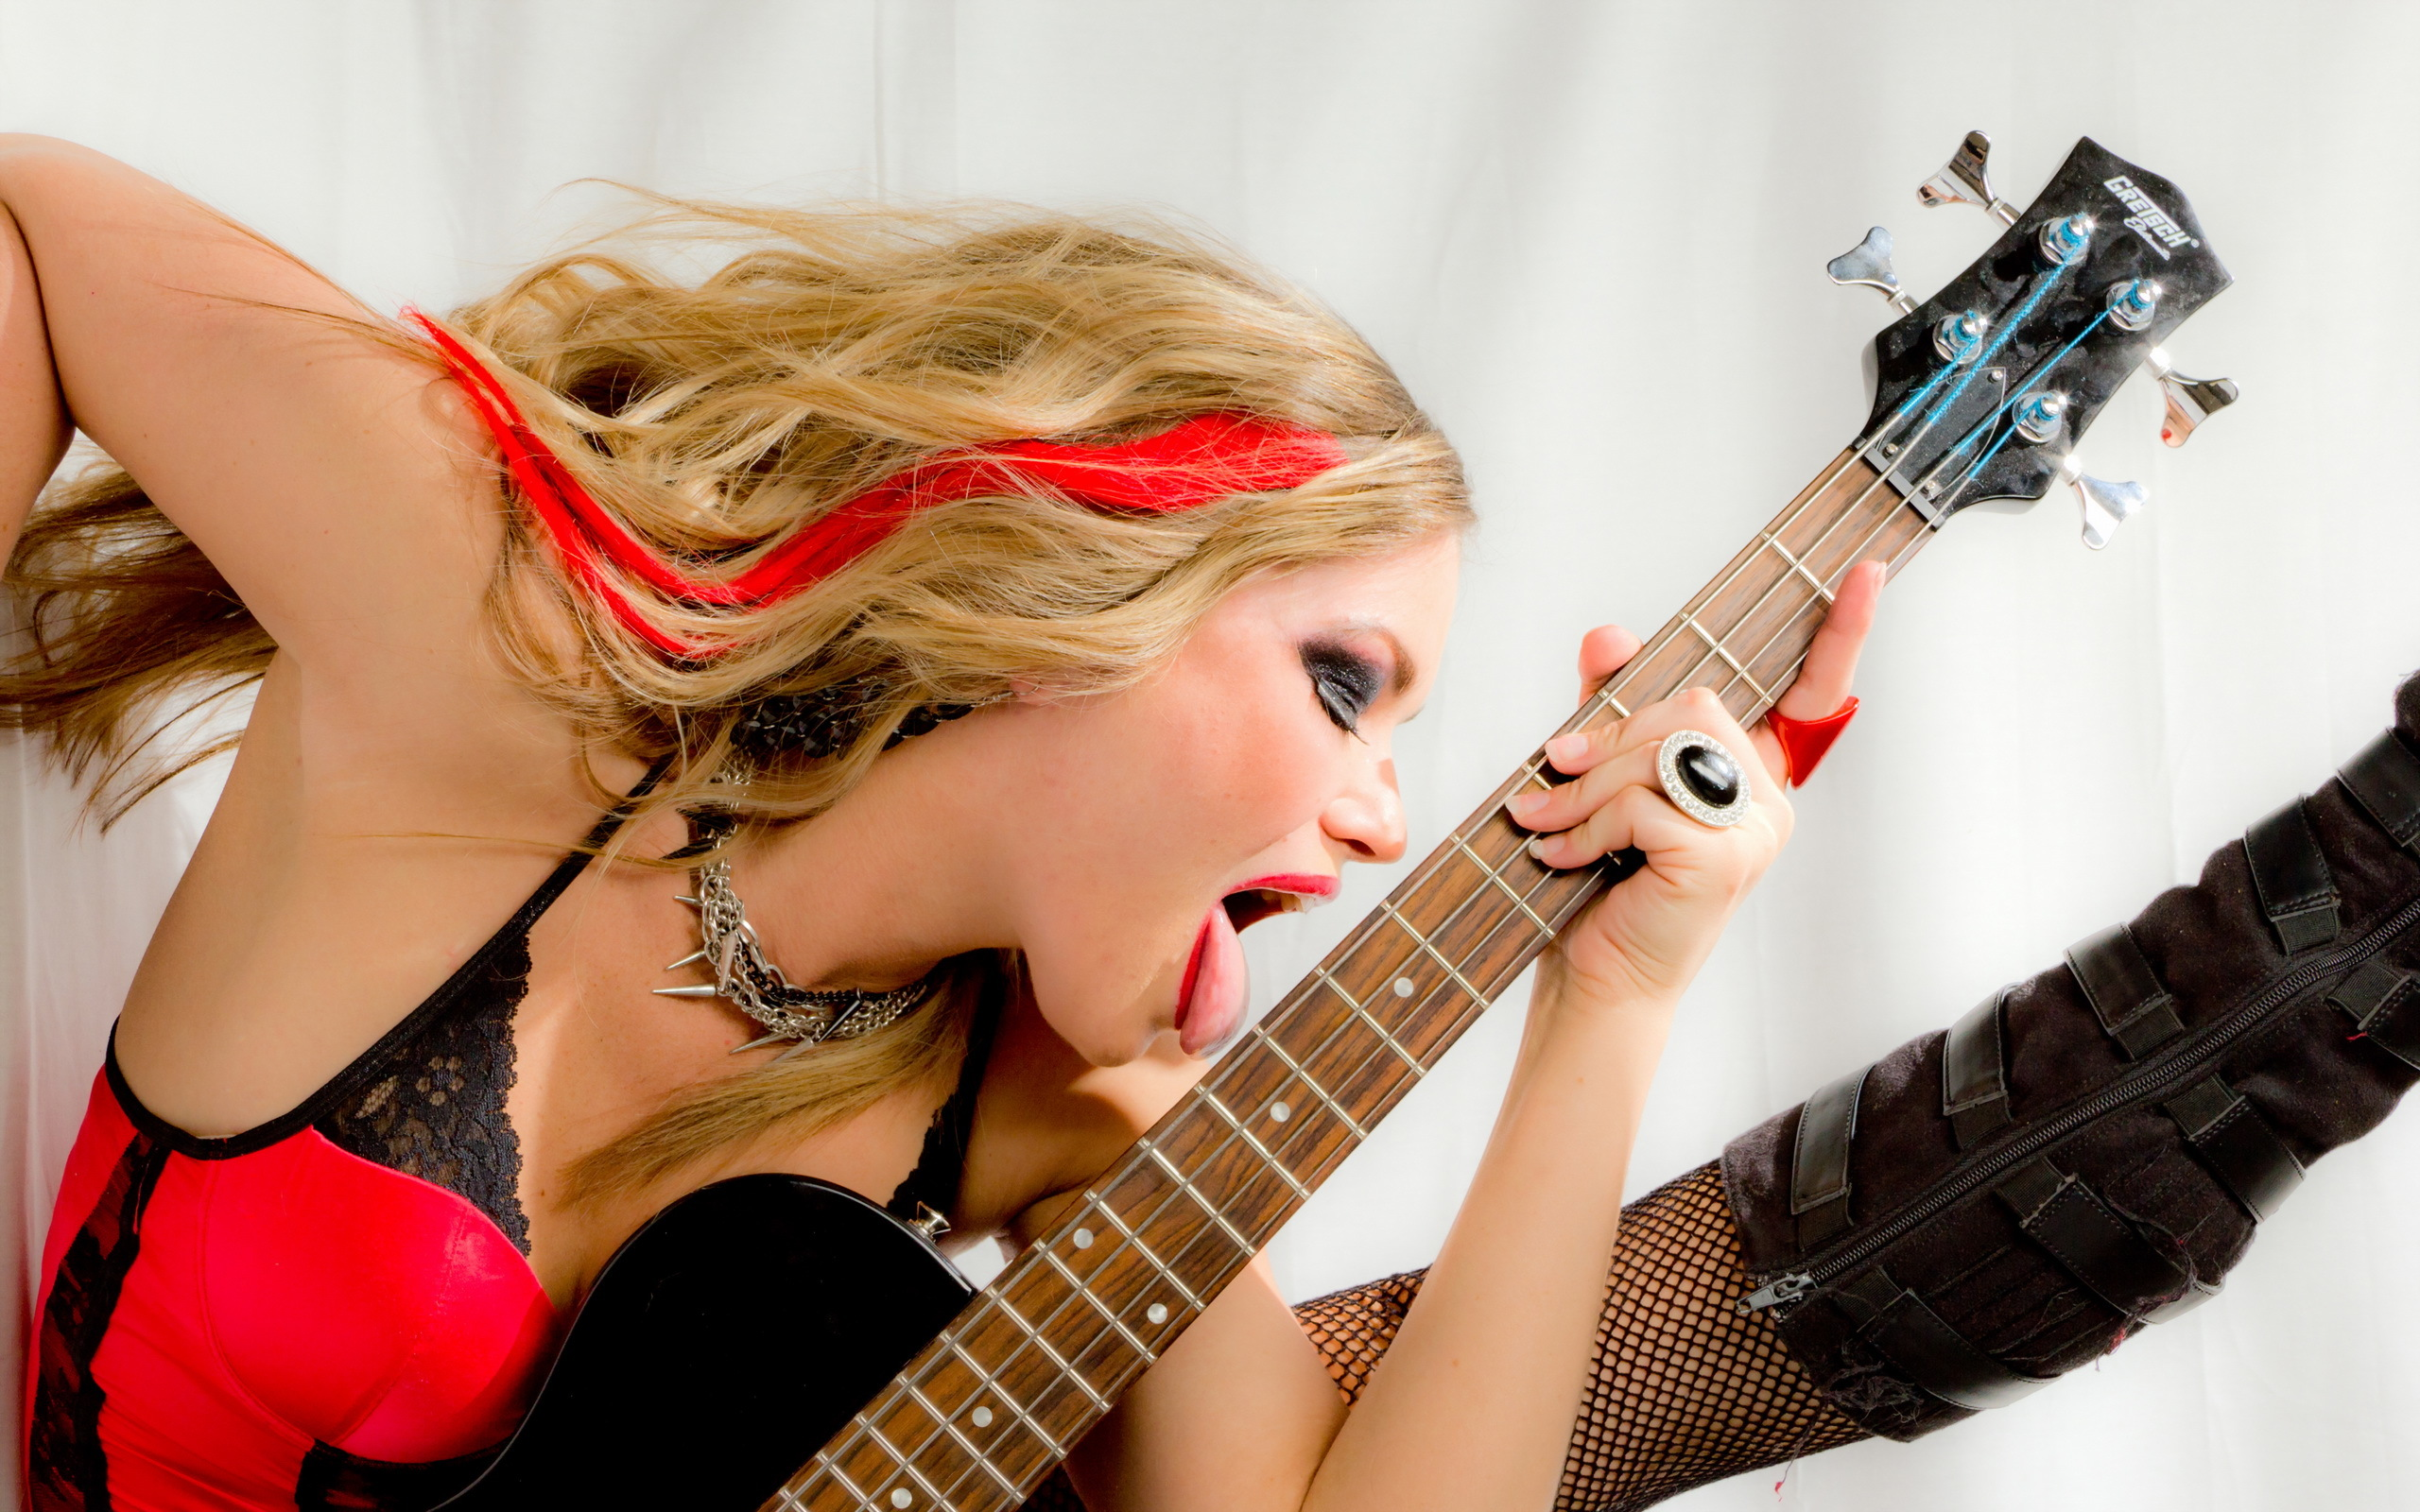 Hot girl guitar #1